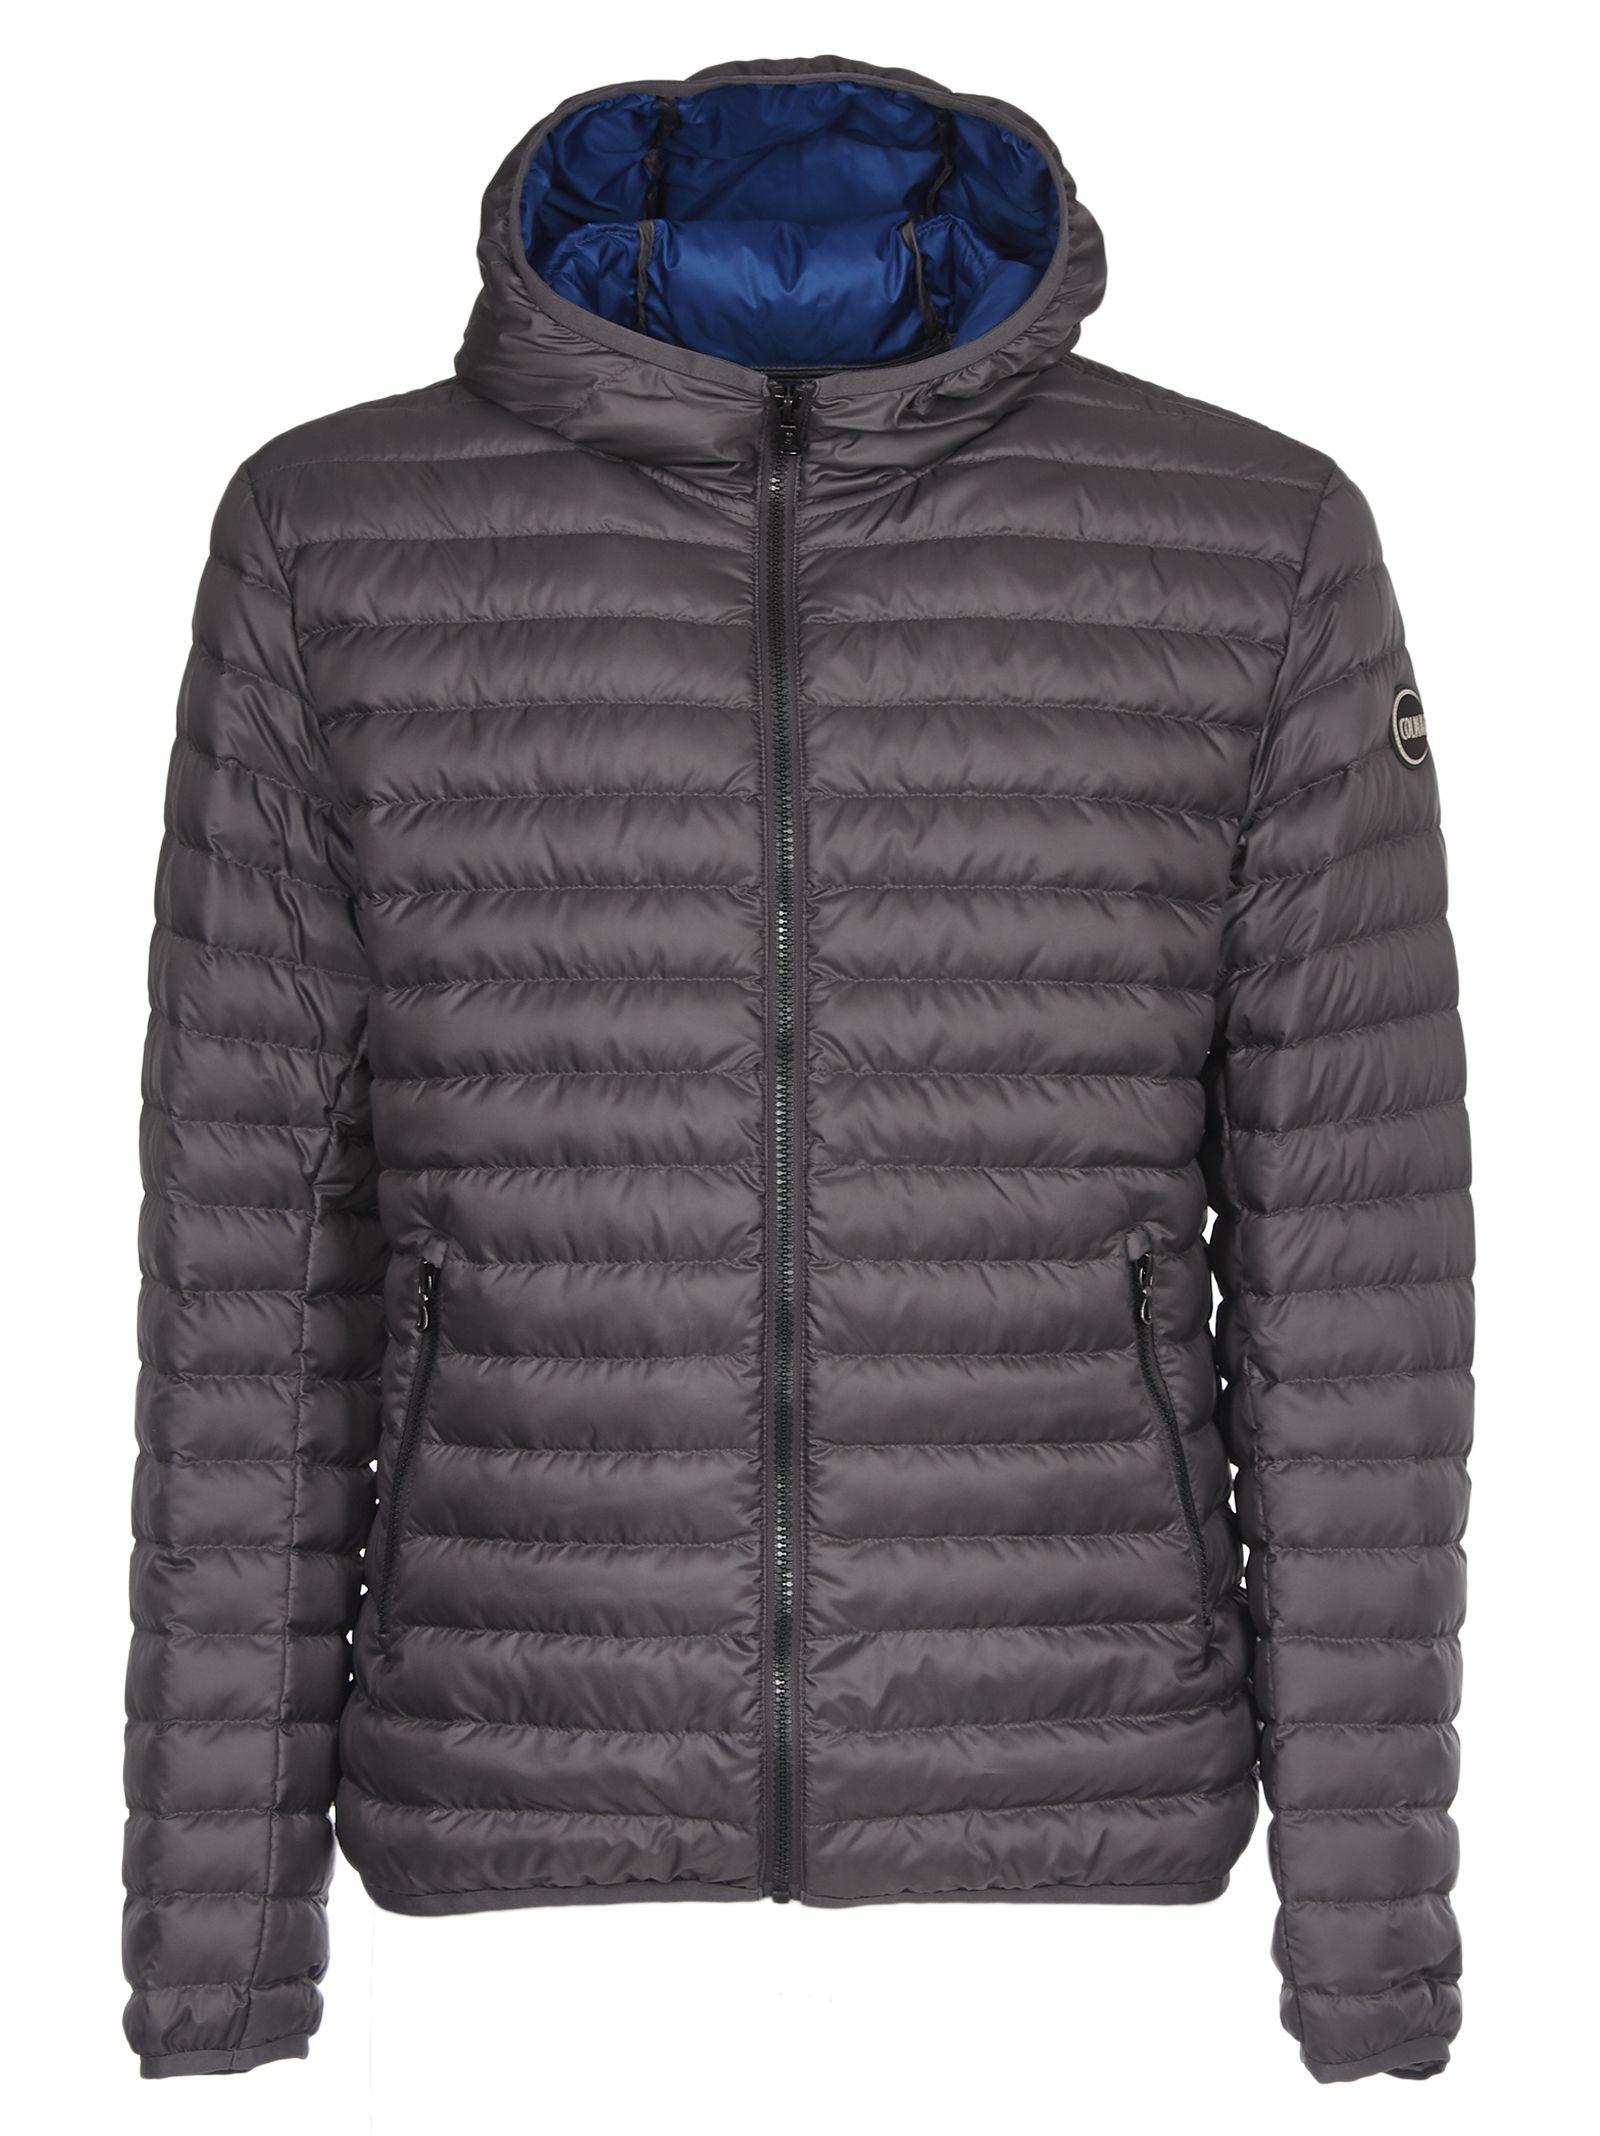 Colmar Logo Patch Padded Jacket In Grey Modesens Padded Jacket Jackets Puffer Jackets [ 2136 x 1600 Pixel ]